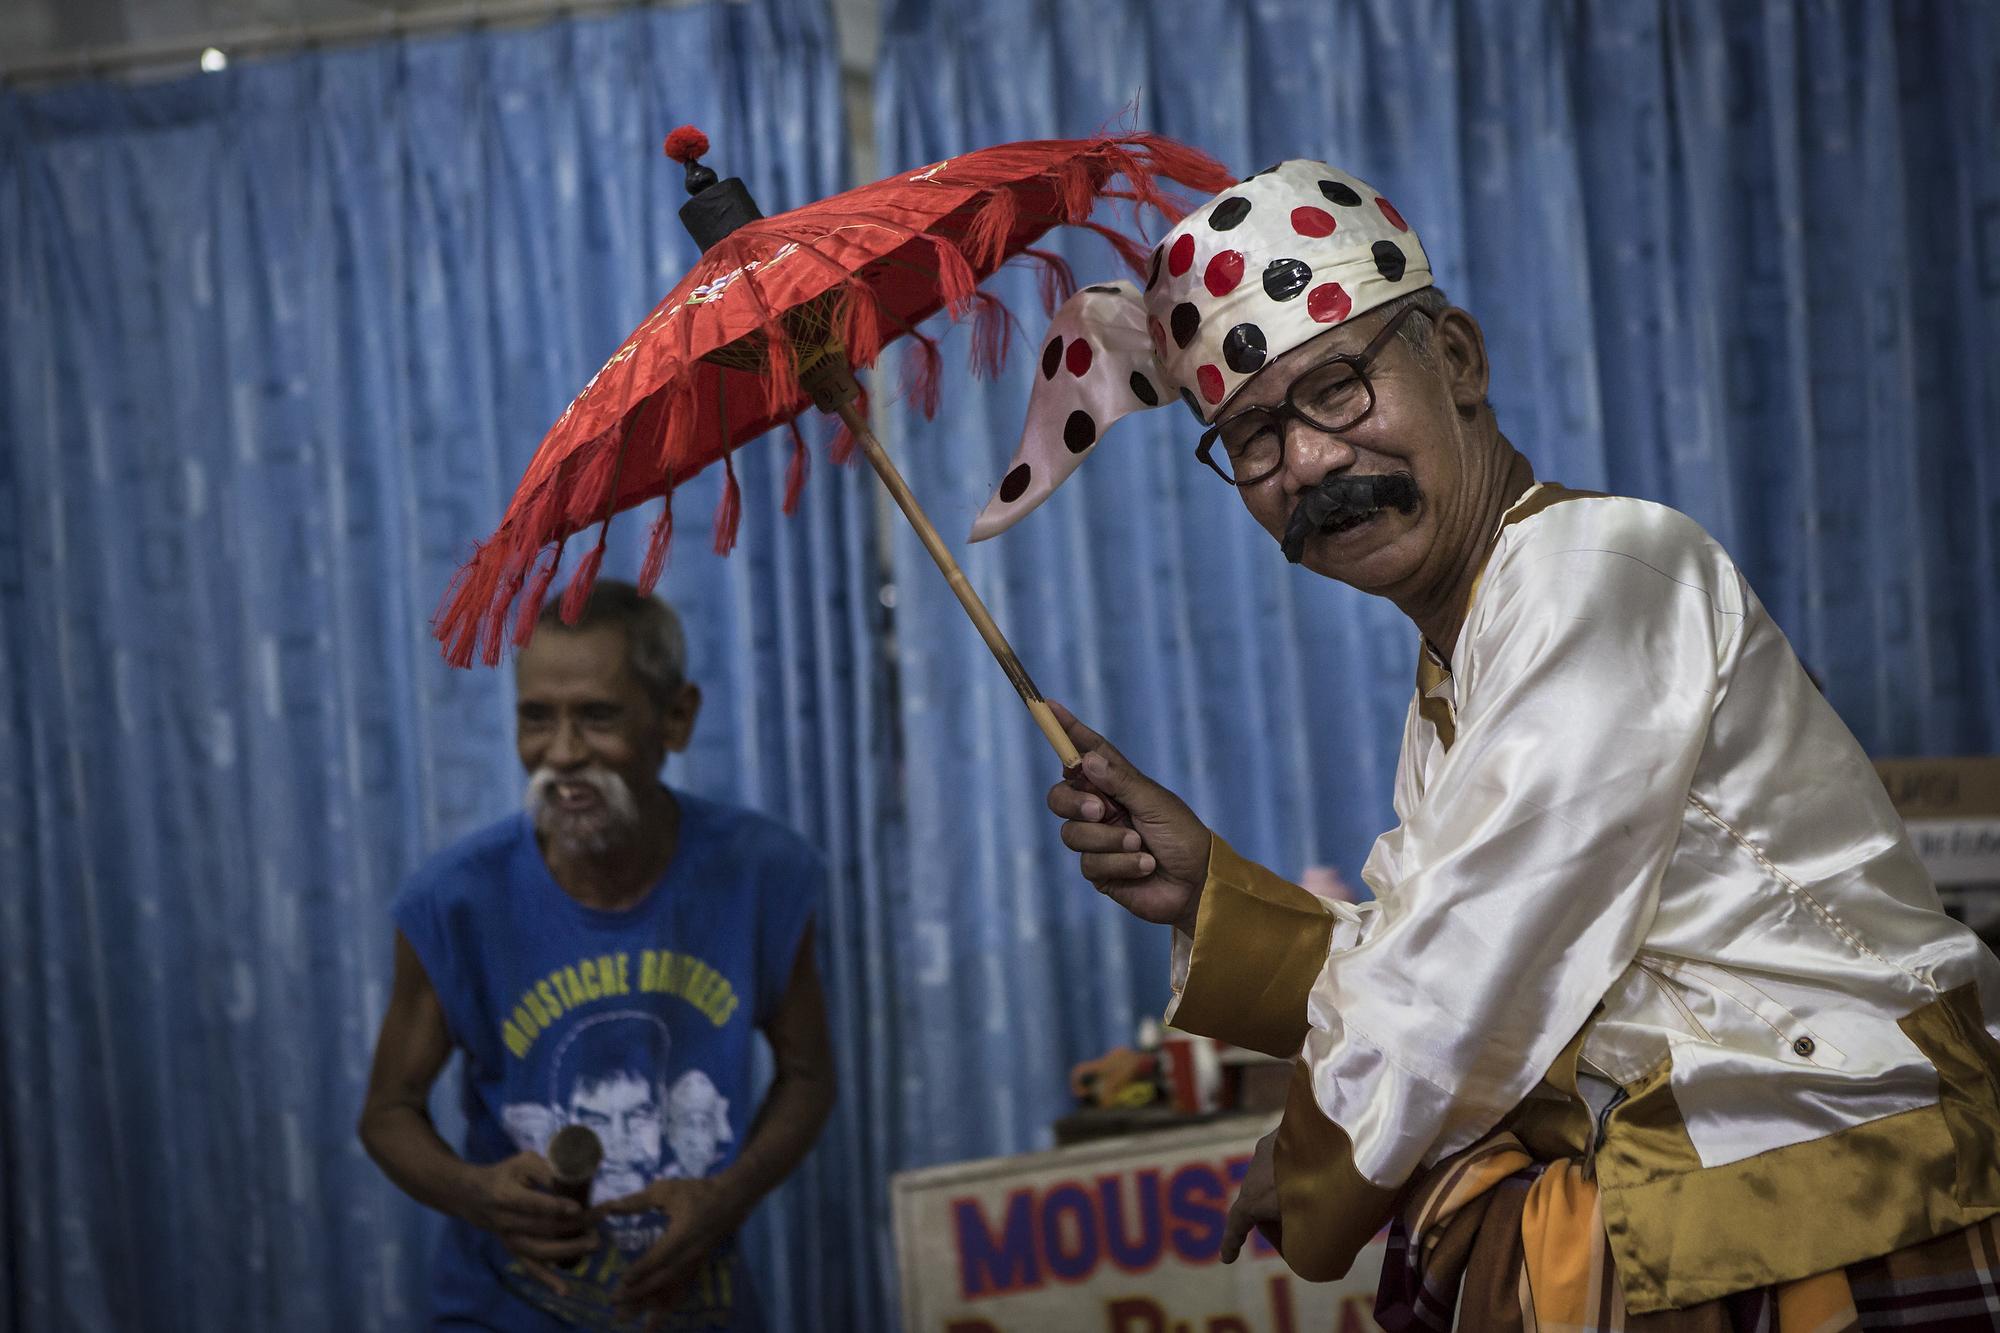 MW_Myanmar_Moustache_Brothers_0525_edit.jpg